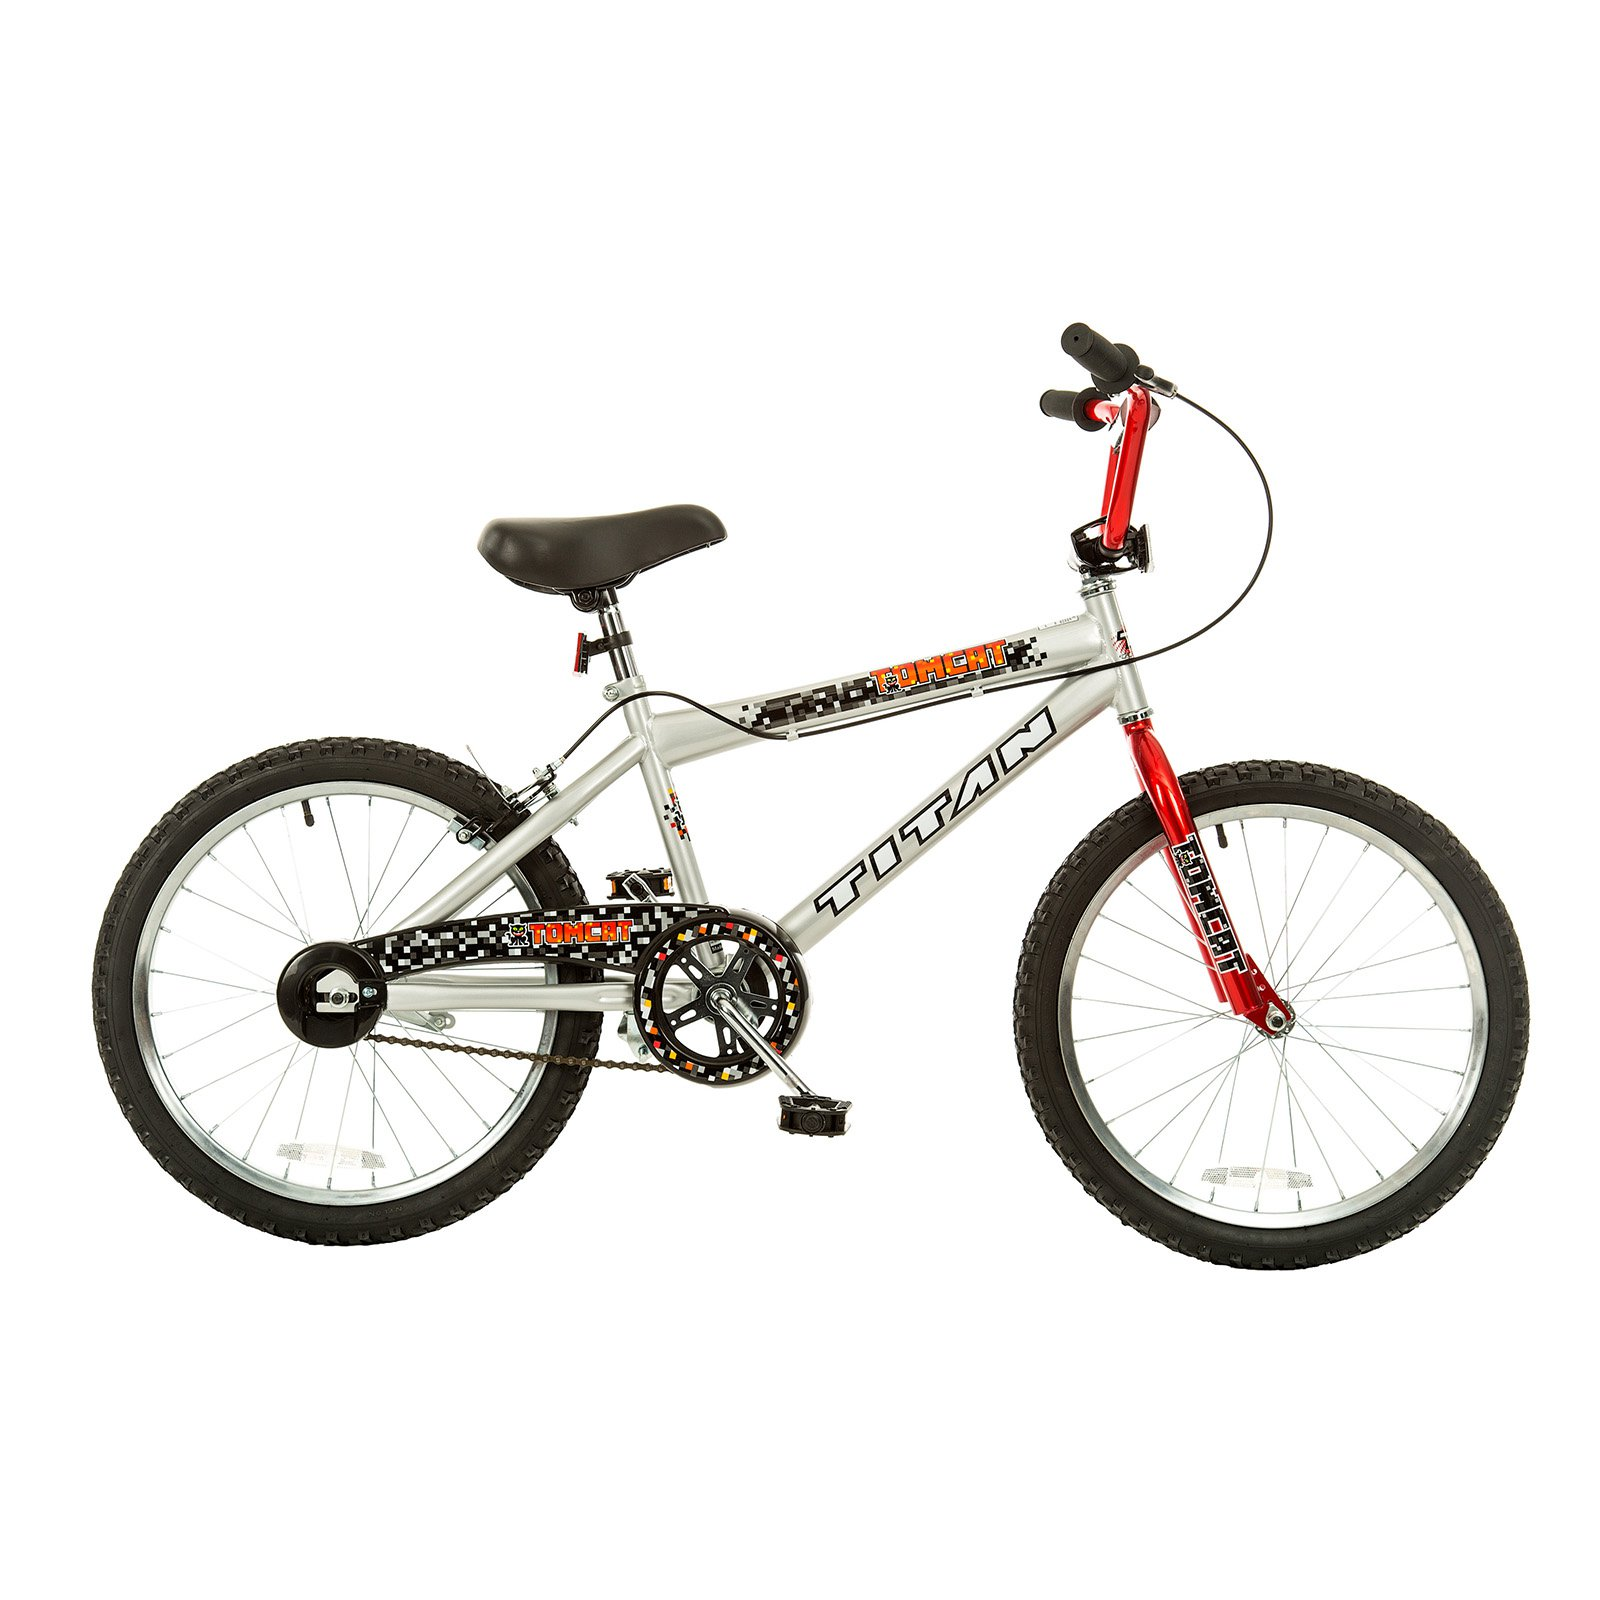 Titan 20 in. Boys Tomcat BMX Bike by BIKE USA Inc